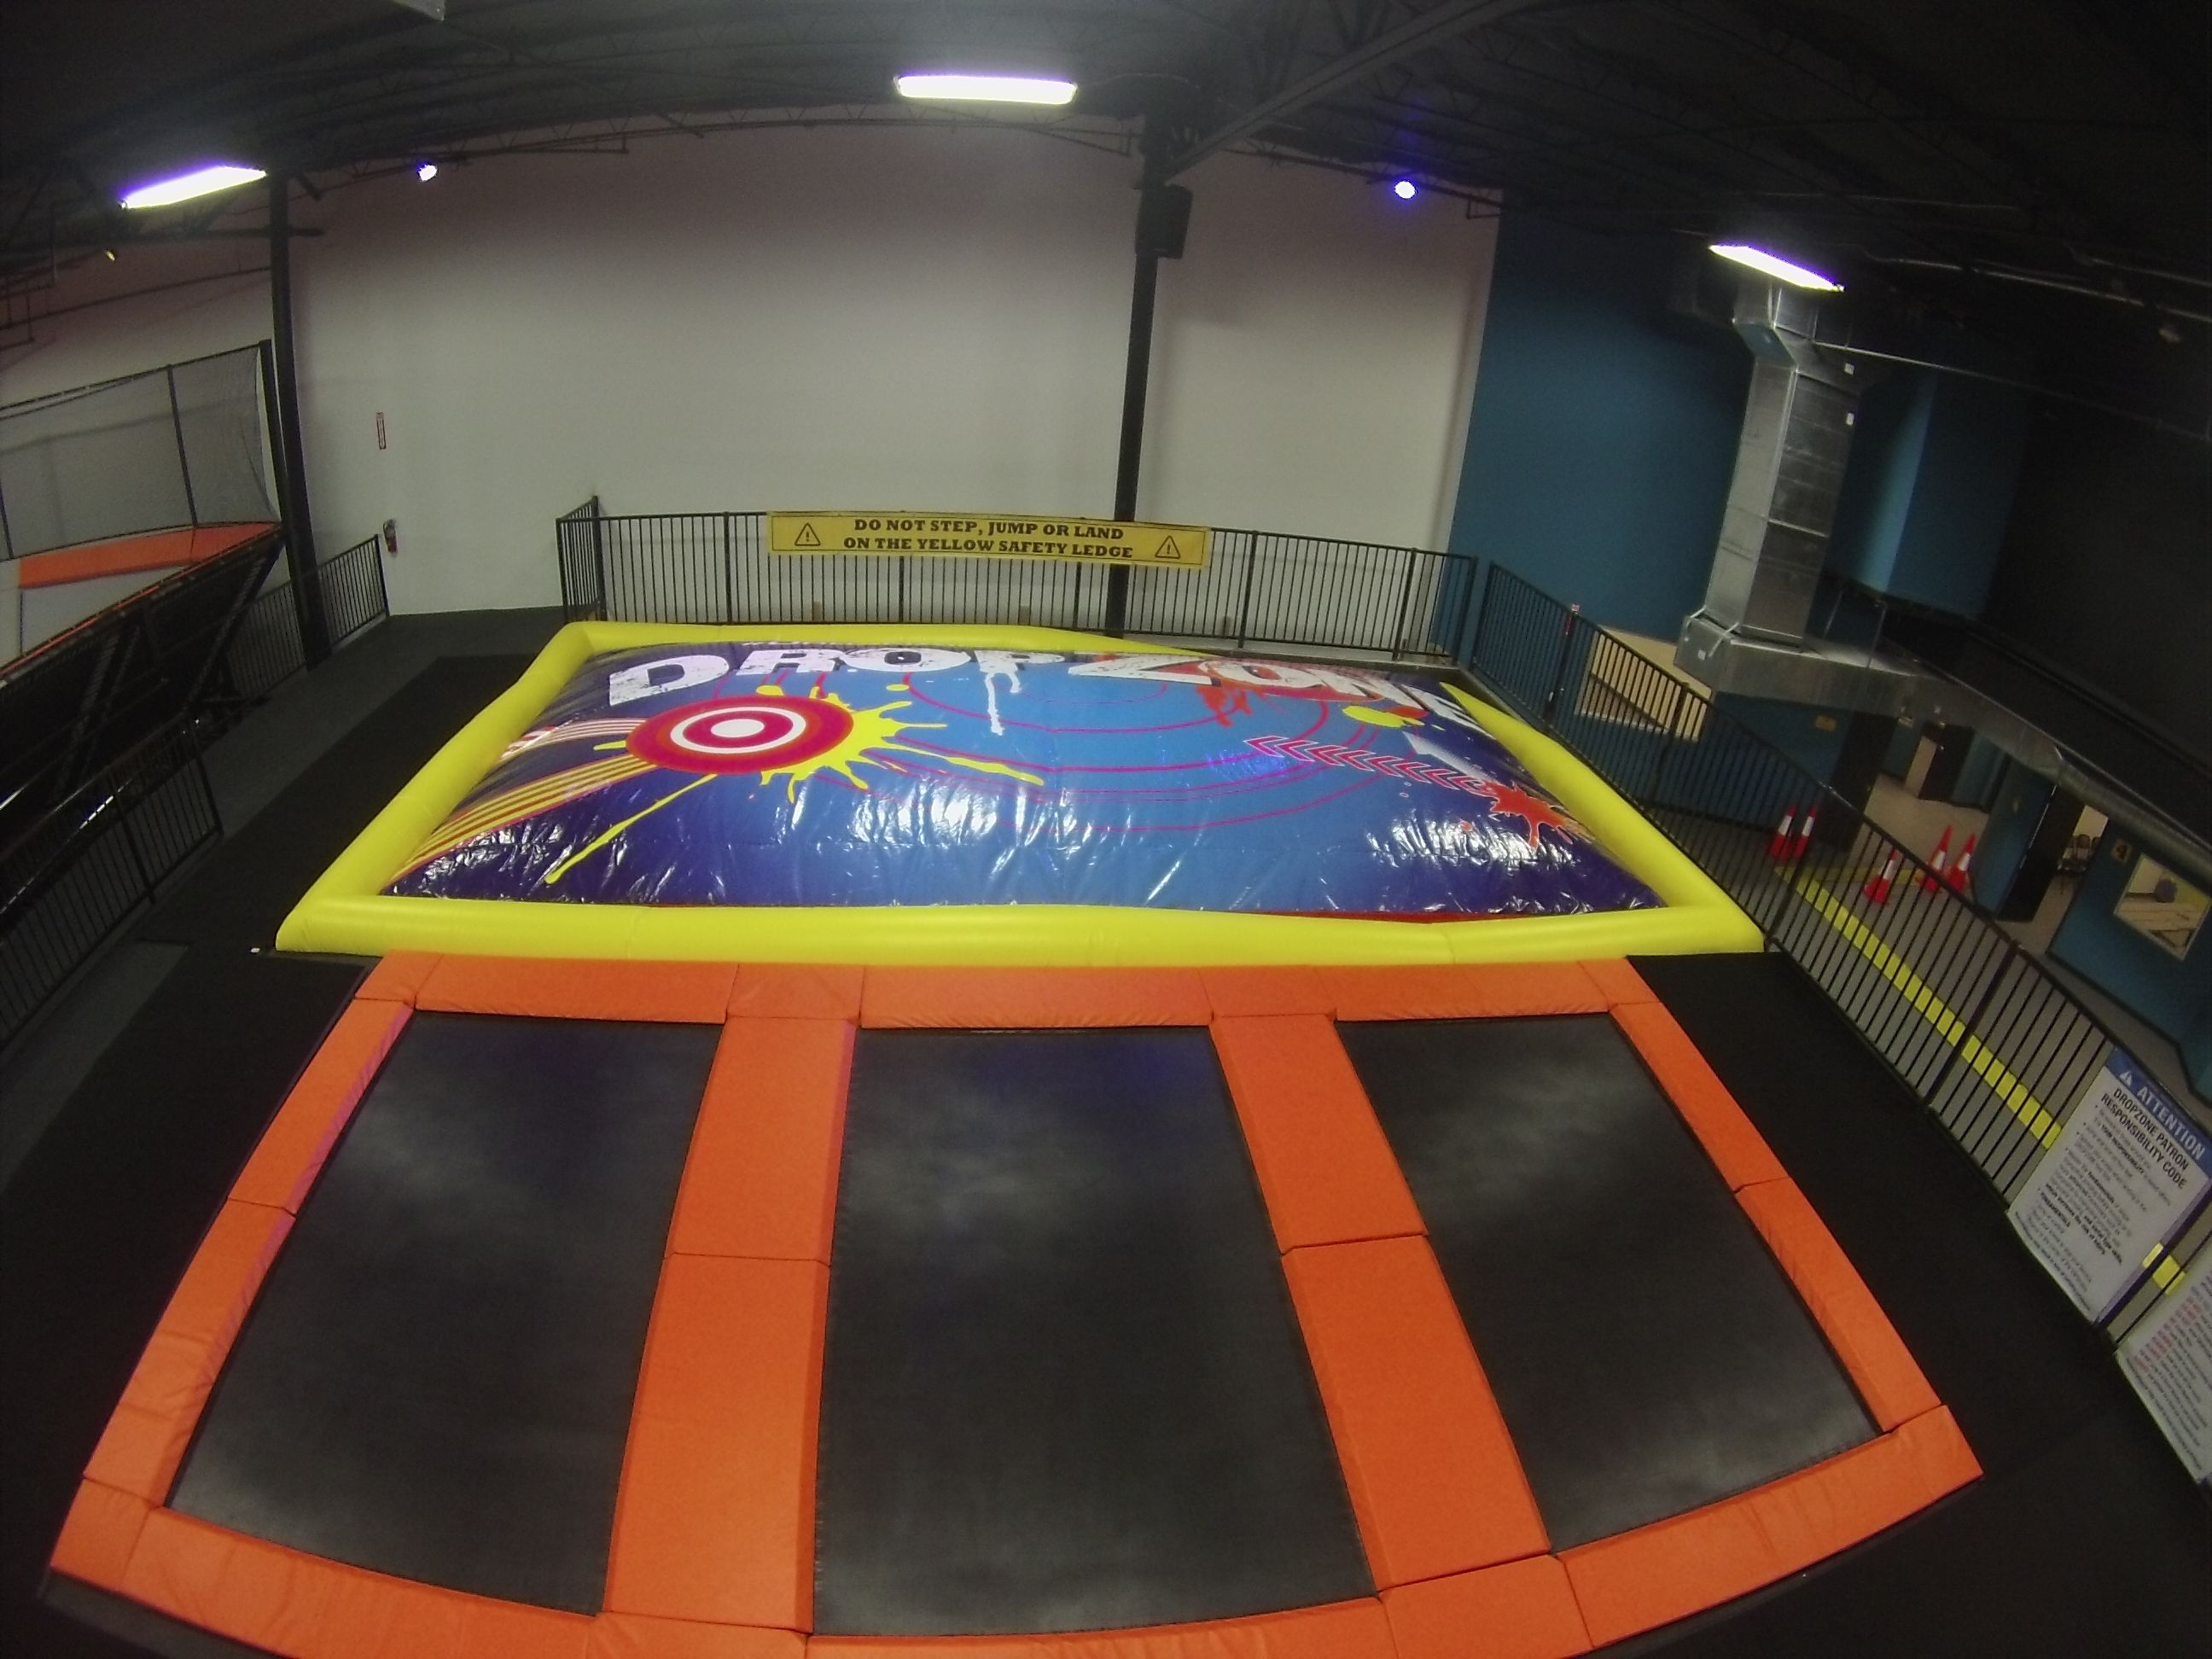 Code promo trampoline park lyon